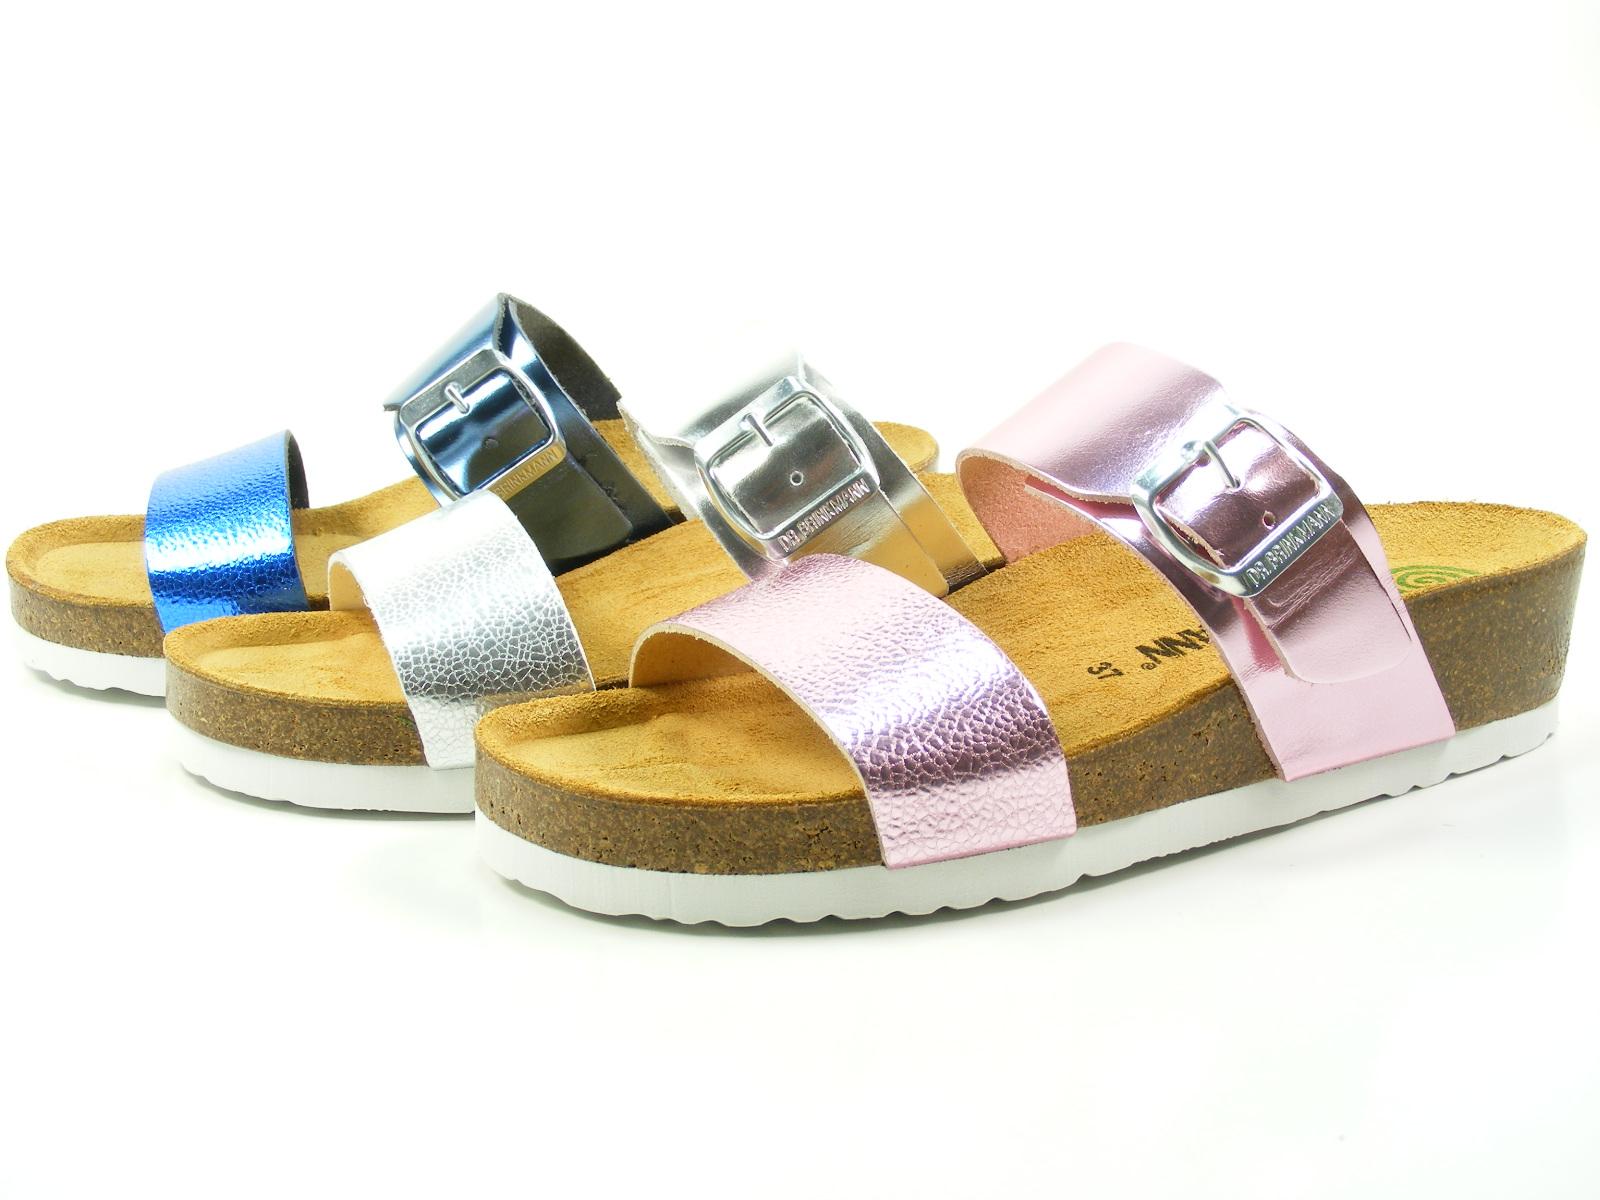 cb29f26fd0a6e Dr. Brinkmann Schuhe 701144 Damen Metallic Keil Pantoletten Sandalen Clogs